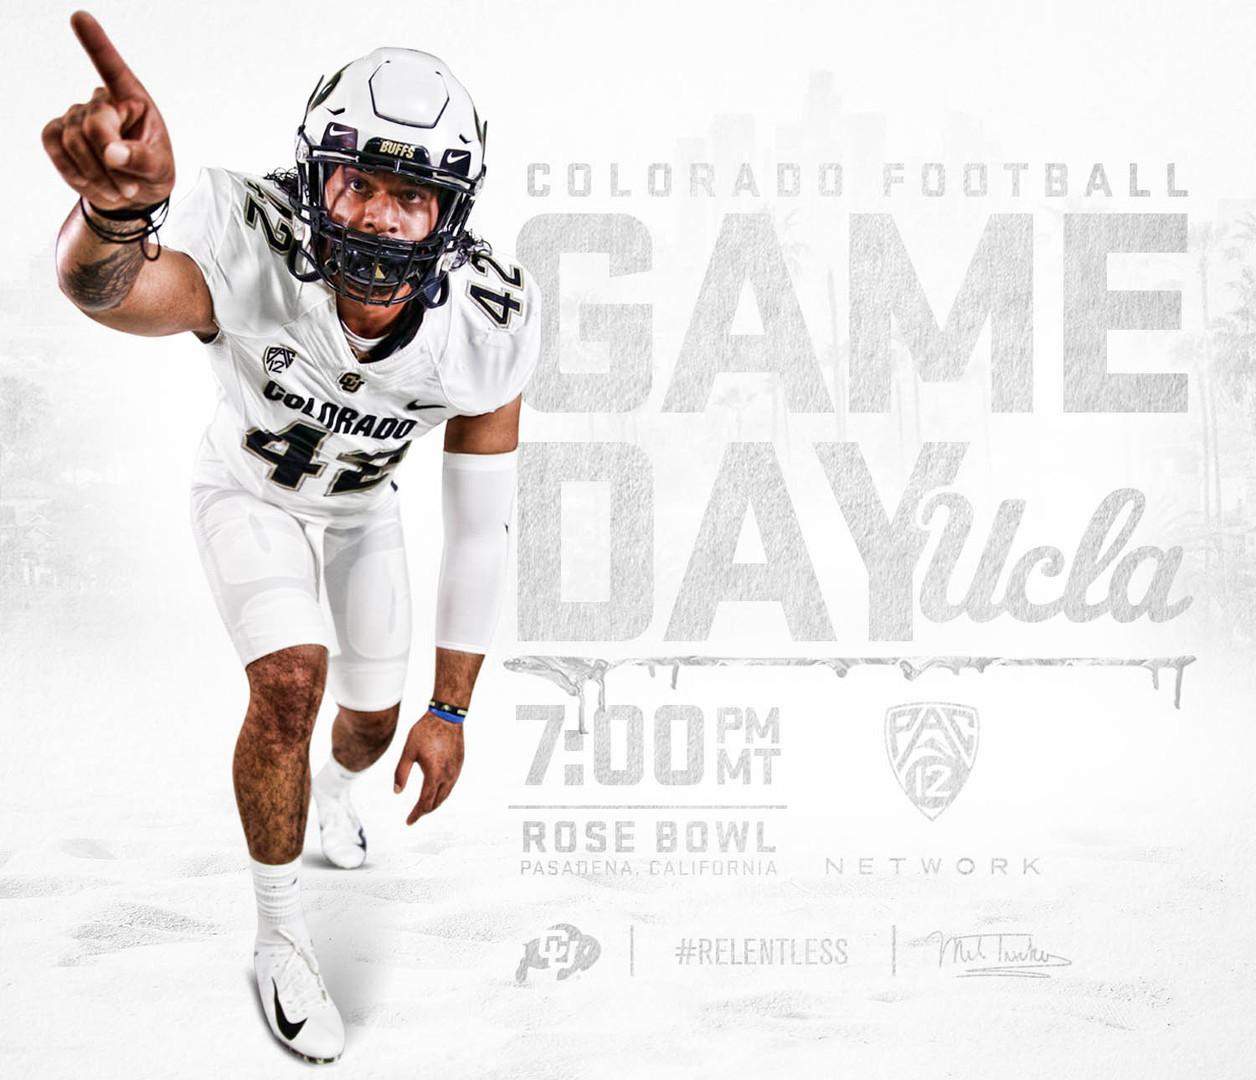 Gameday - UCLA 02a.jpg